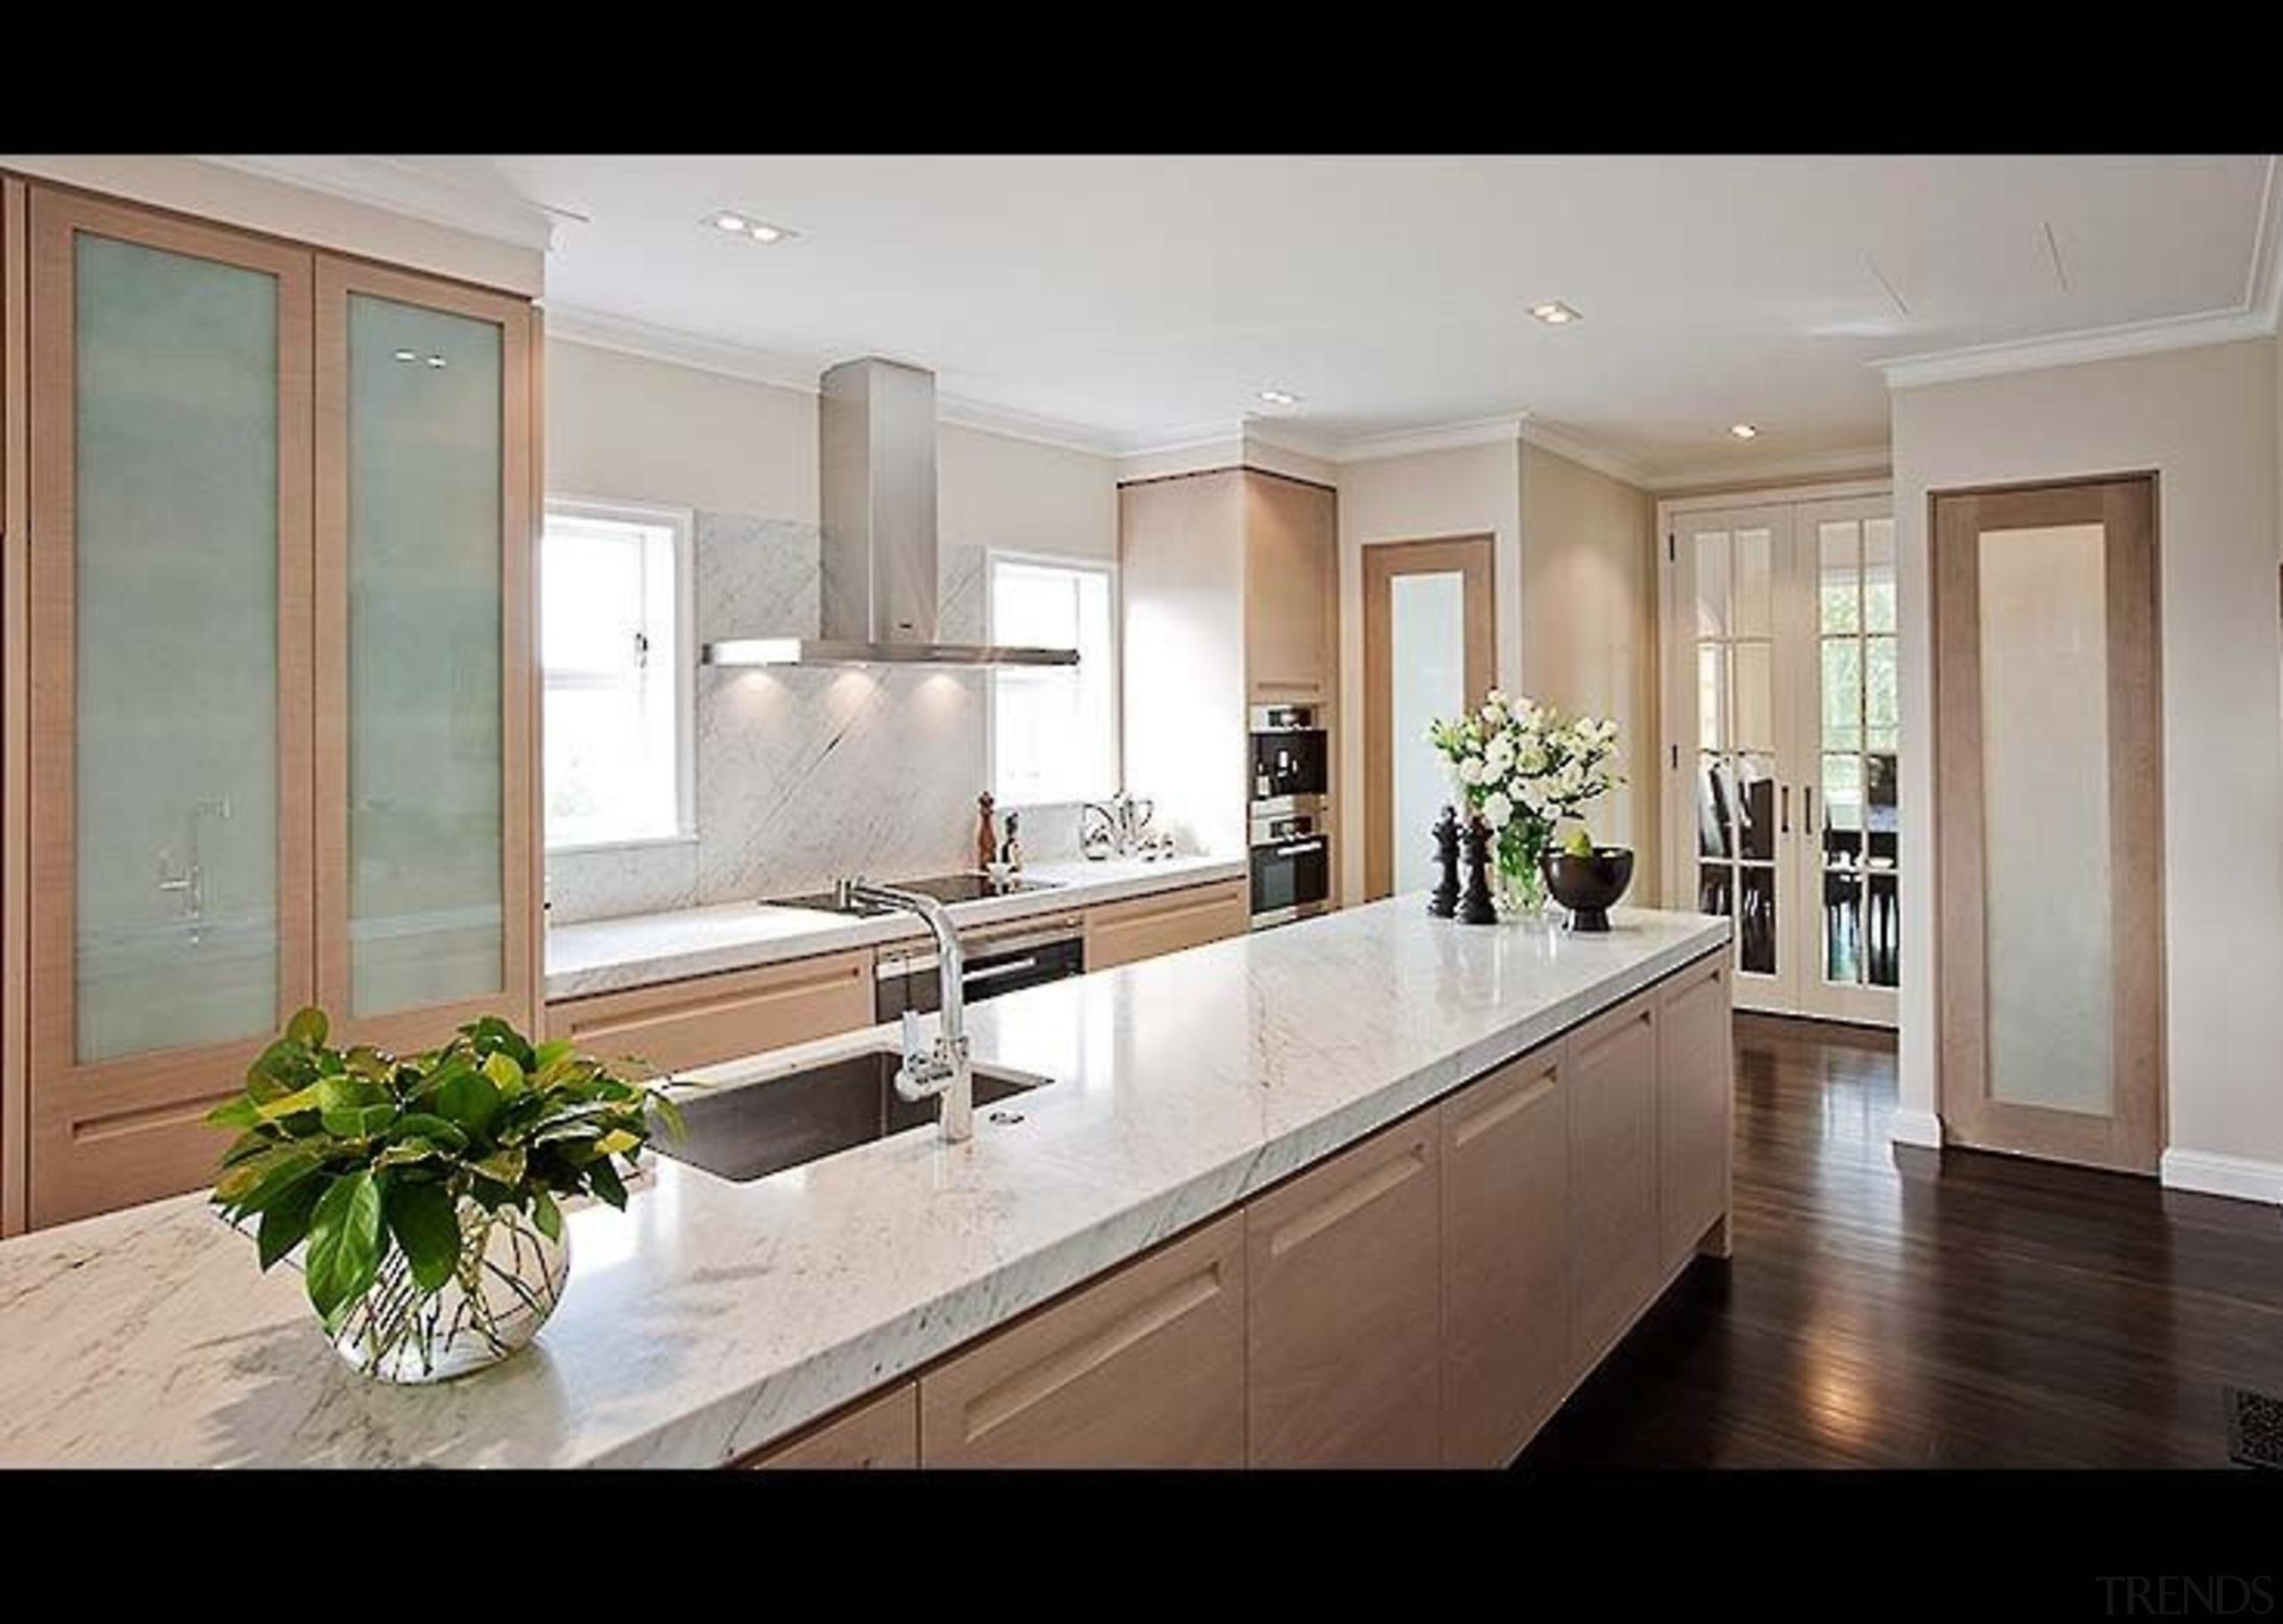 Bistro Style - countertop | cuisine classique | countertop, cuisine classique, estate, home, interior design, kitchen, property, real estate, window, gray